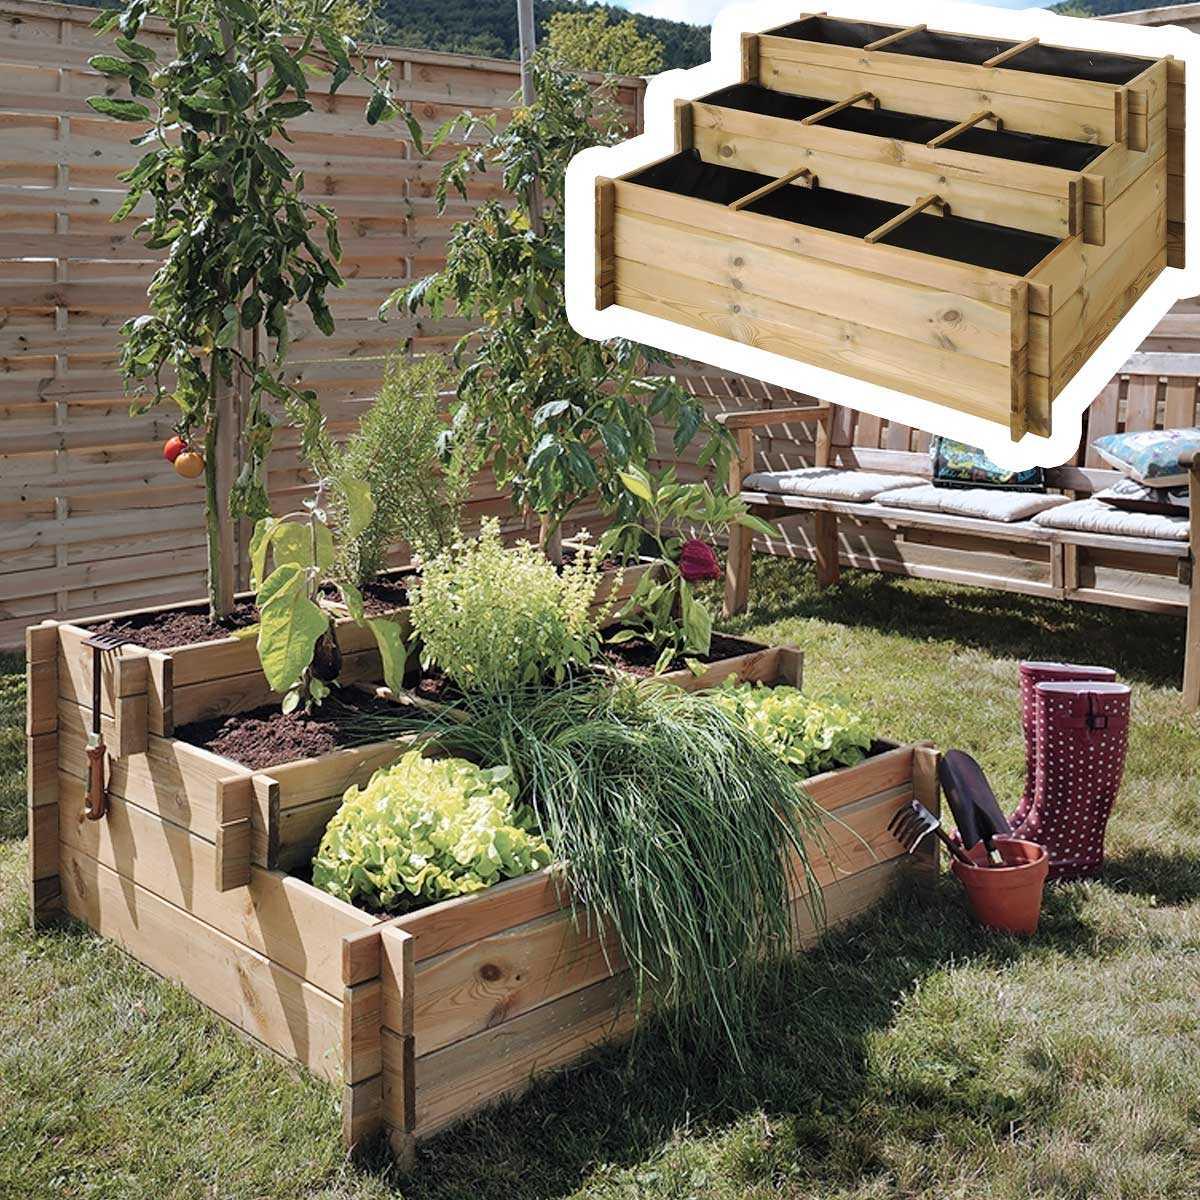 carr potager 3 tages en bois trait g otextile carr potager. Black Bedroom Furniture Sets. Home Design Ideas